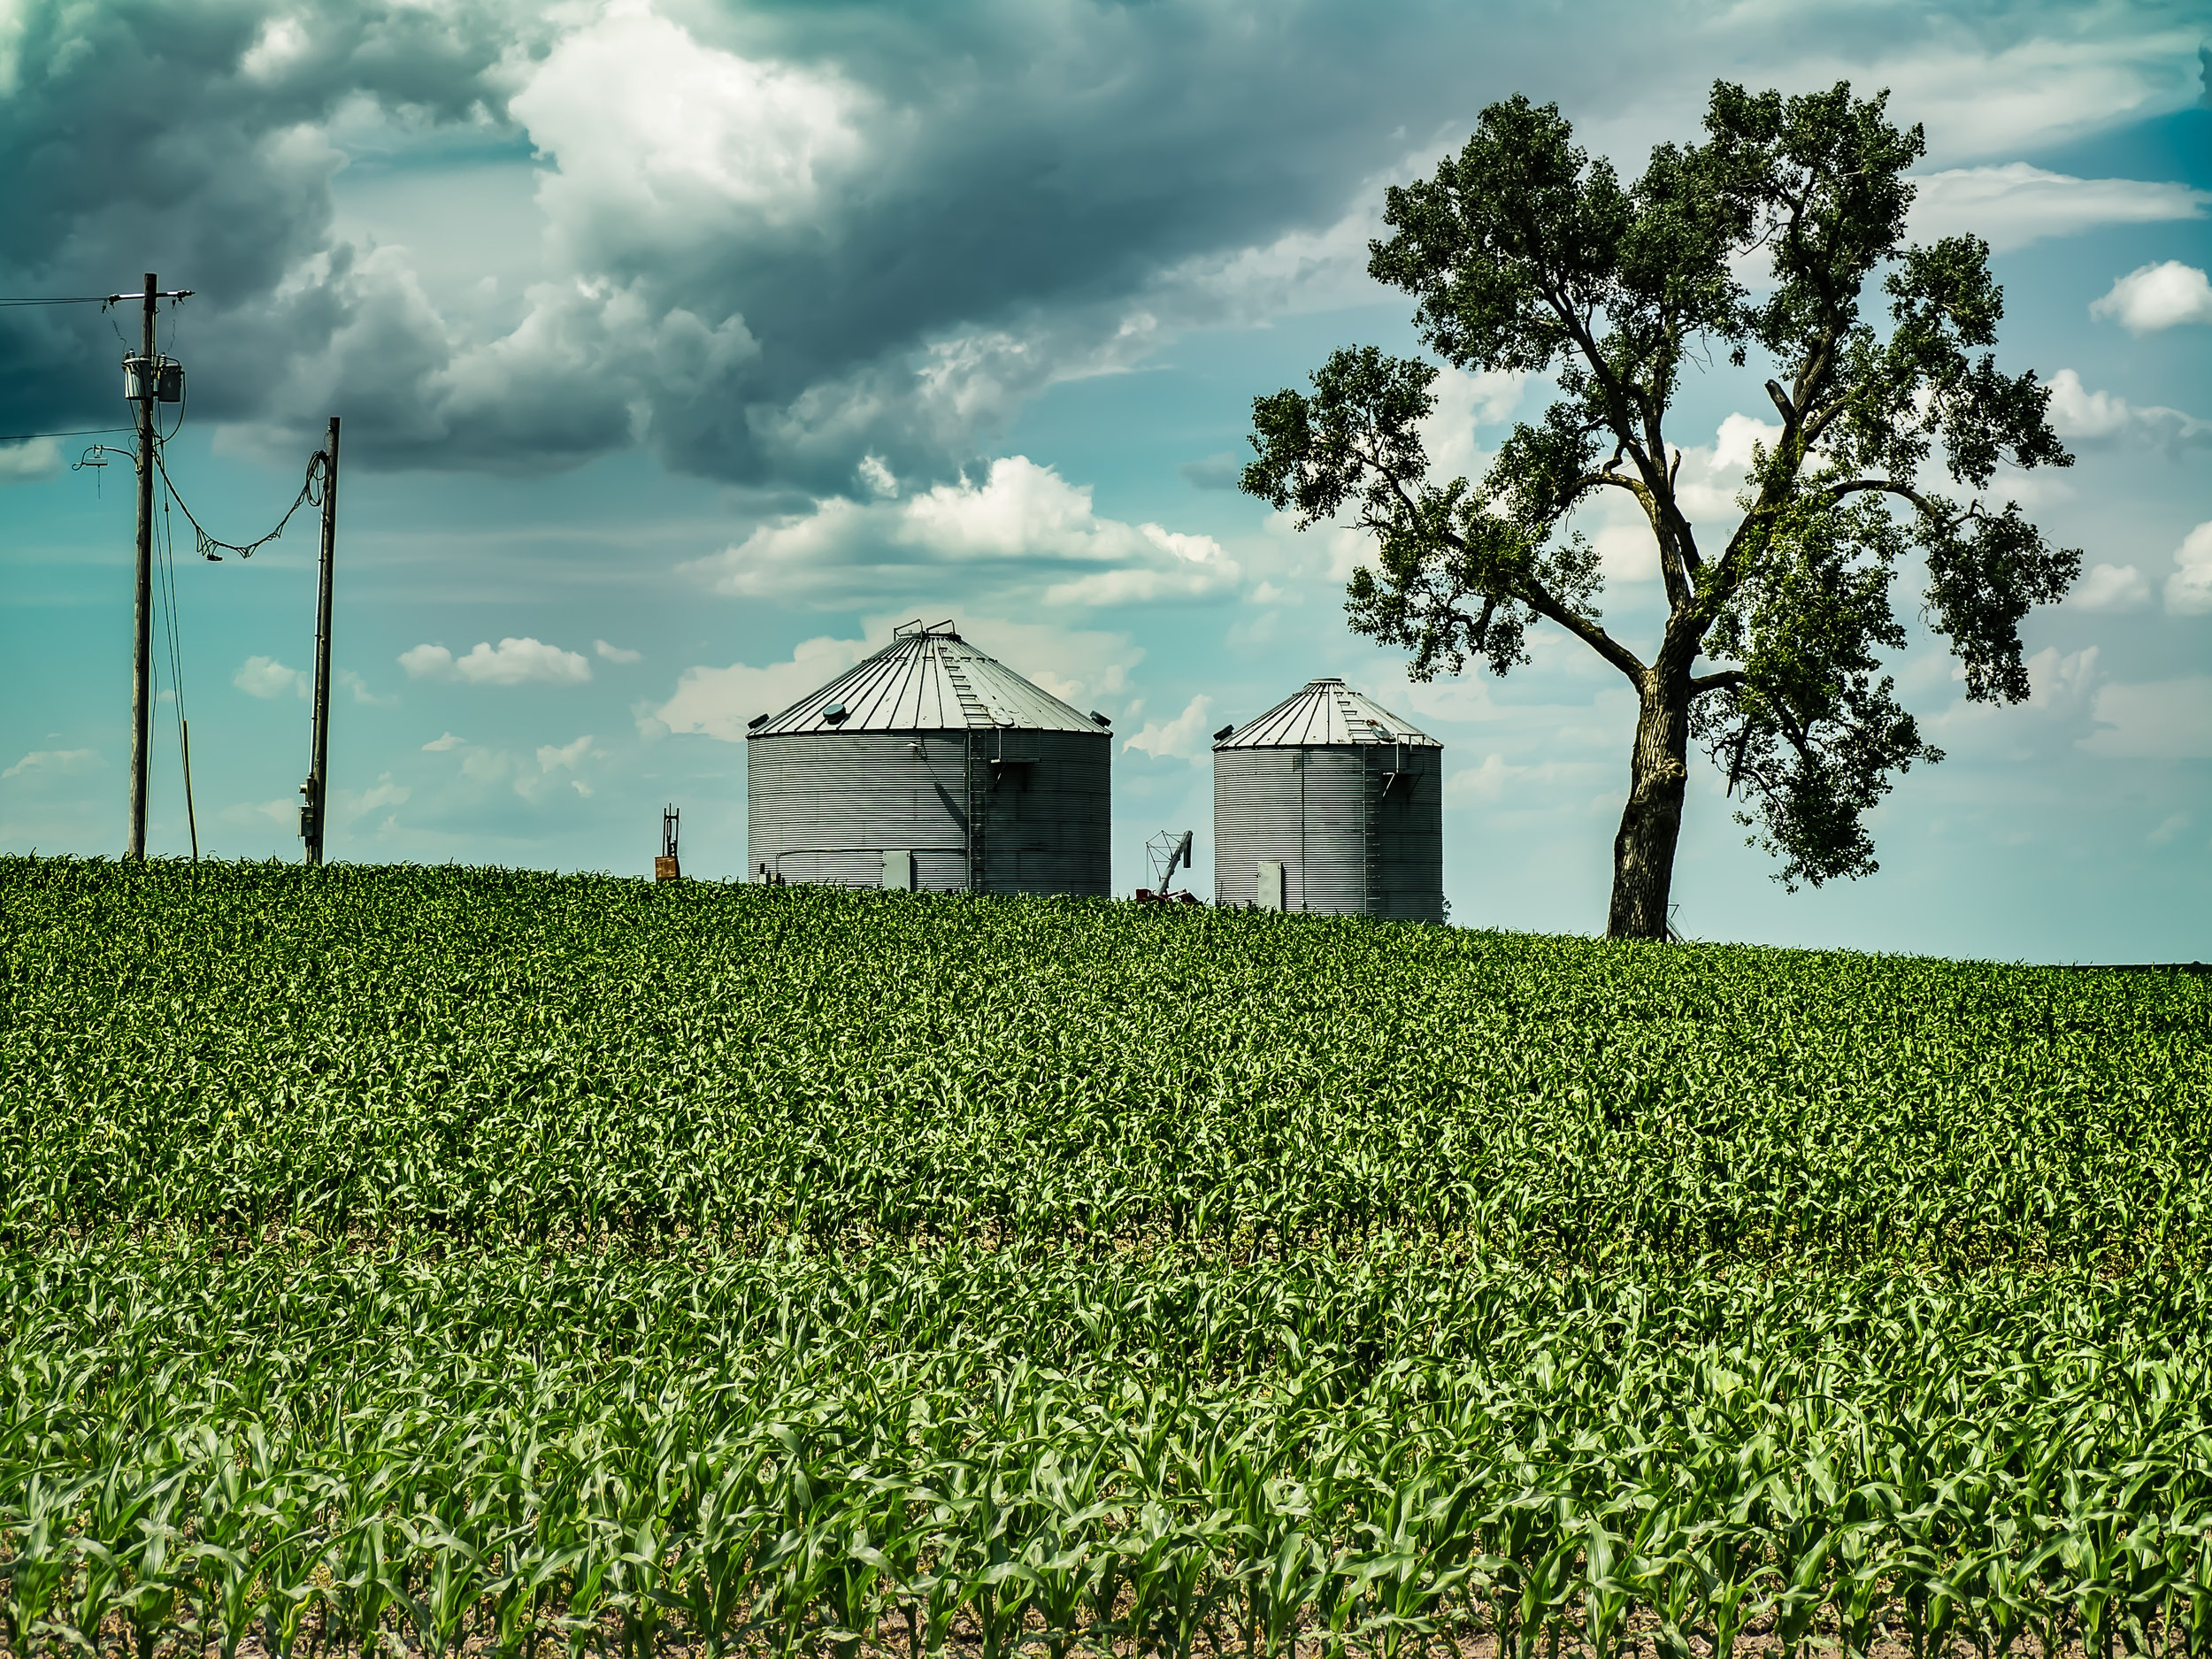 Joshua Tree and Grain Bins